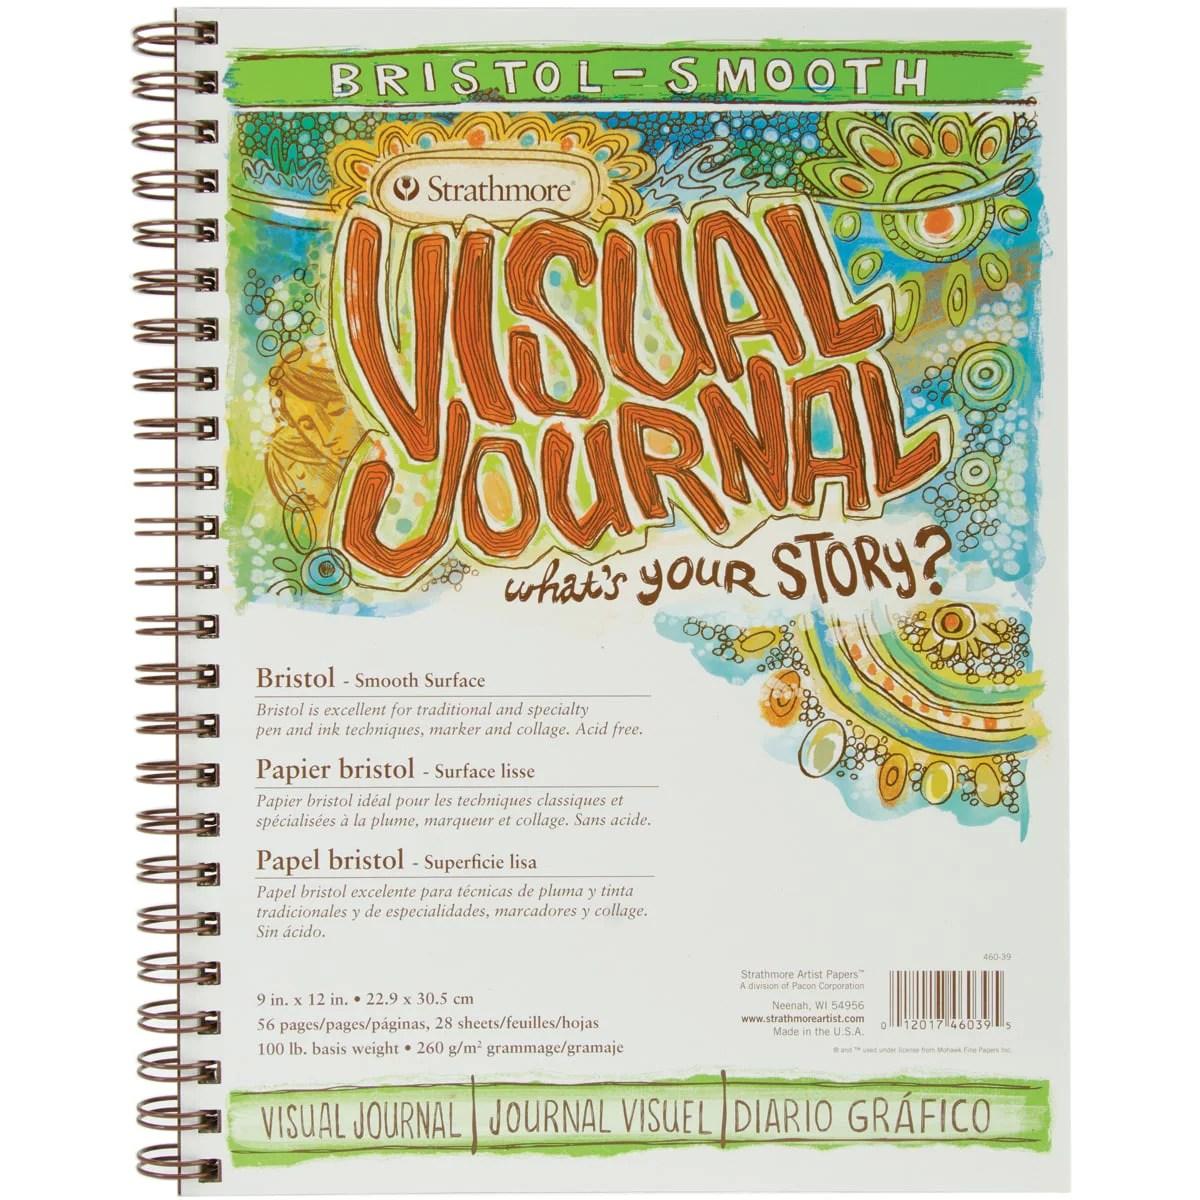 Strathmore Visual Journal Bristol Smooth 9 X12 28 Sheets